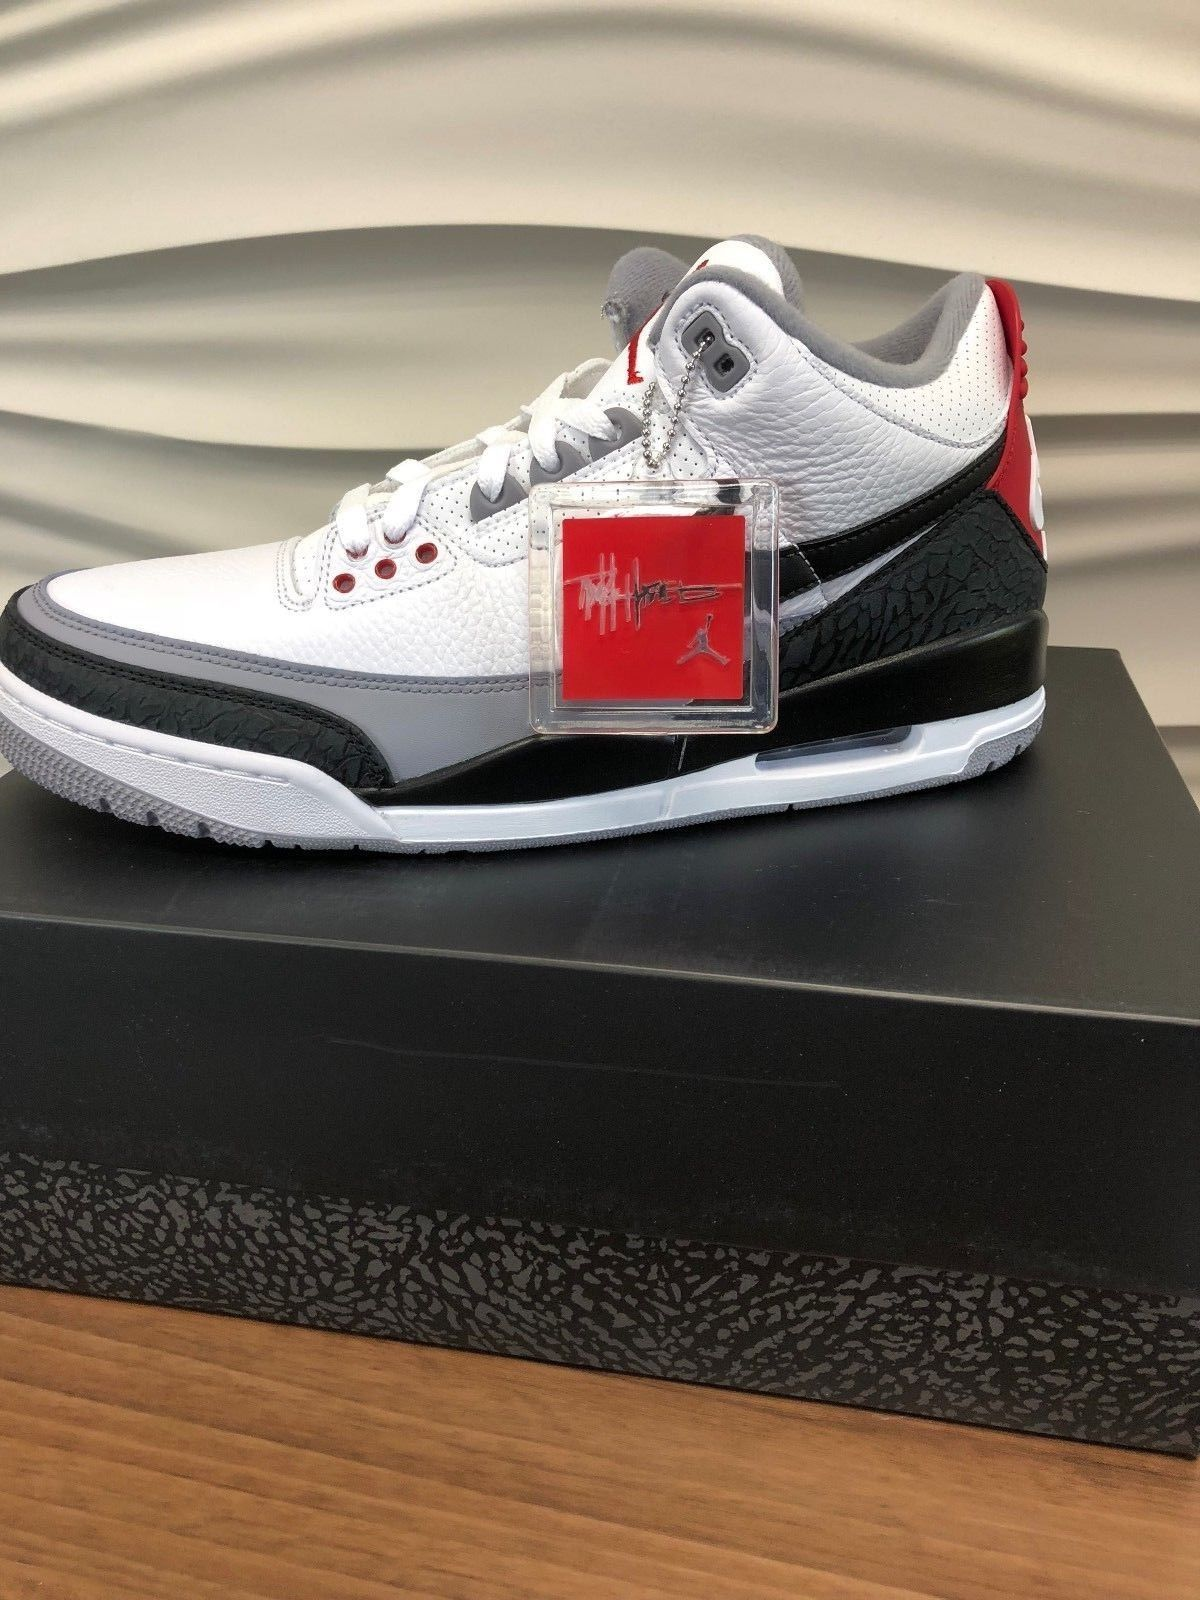 Jordan Air Jordan 3 Retro Tinker Hatfield US Men s 12 White Black-Fire Red 470f46733